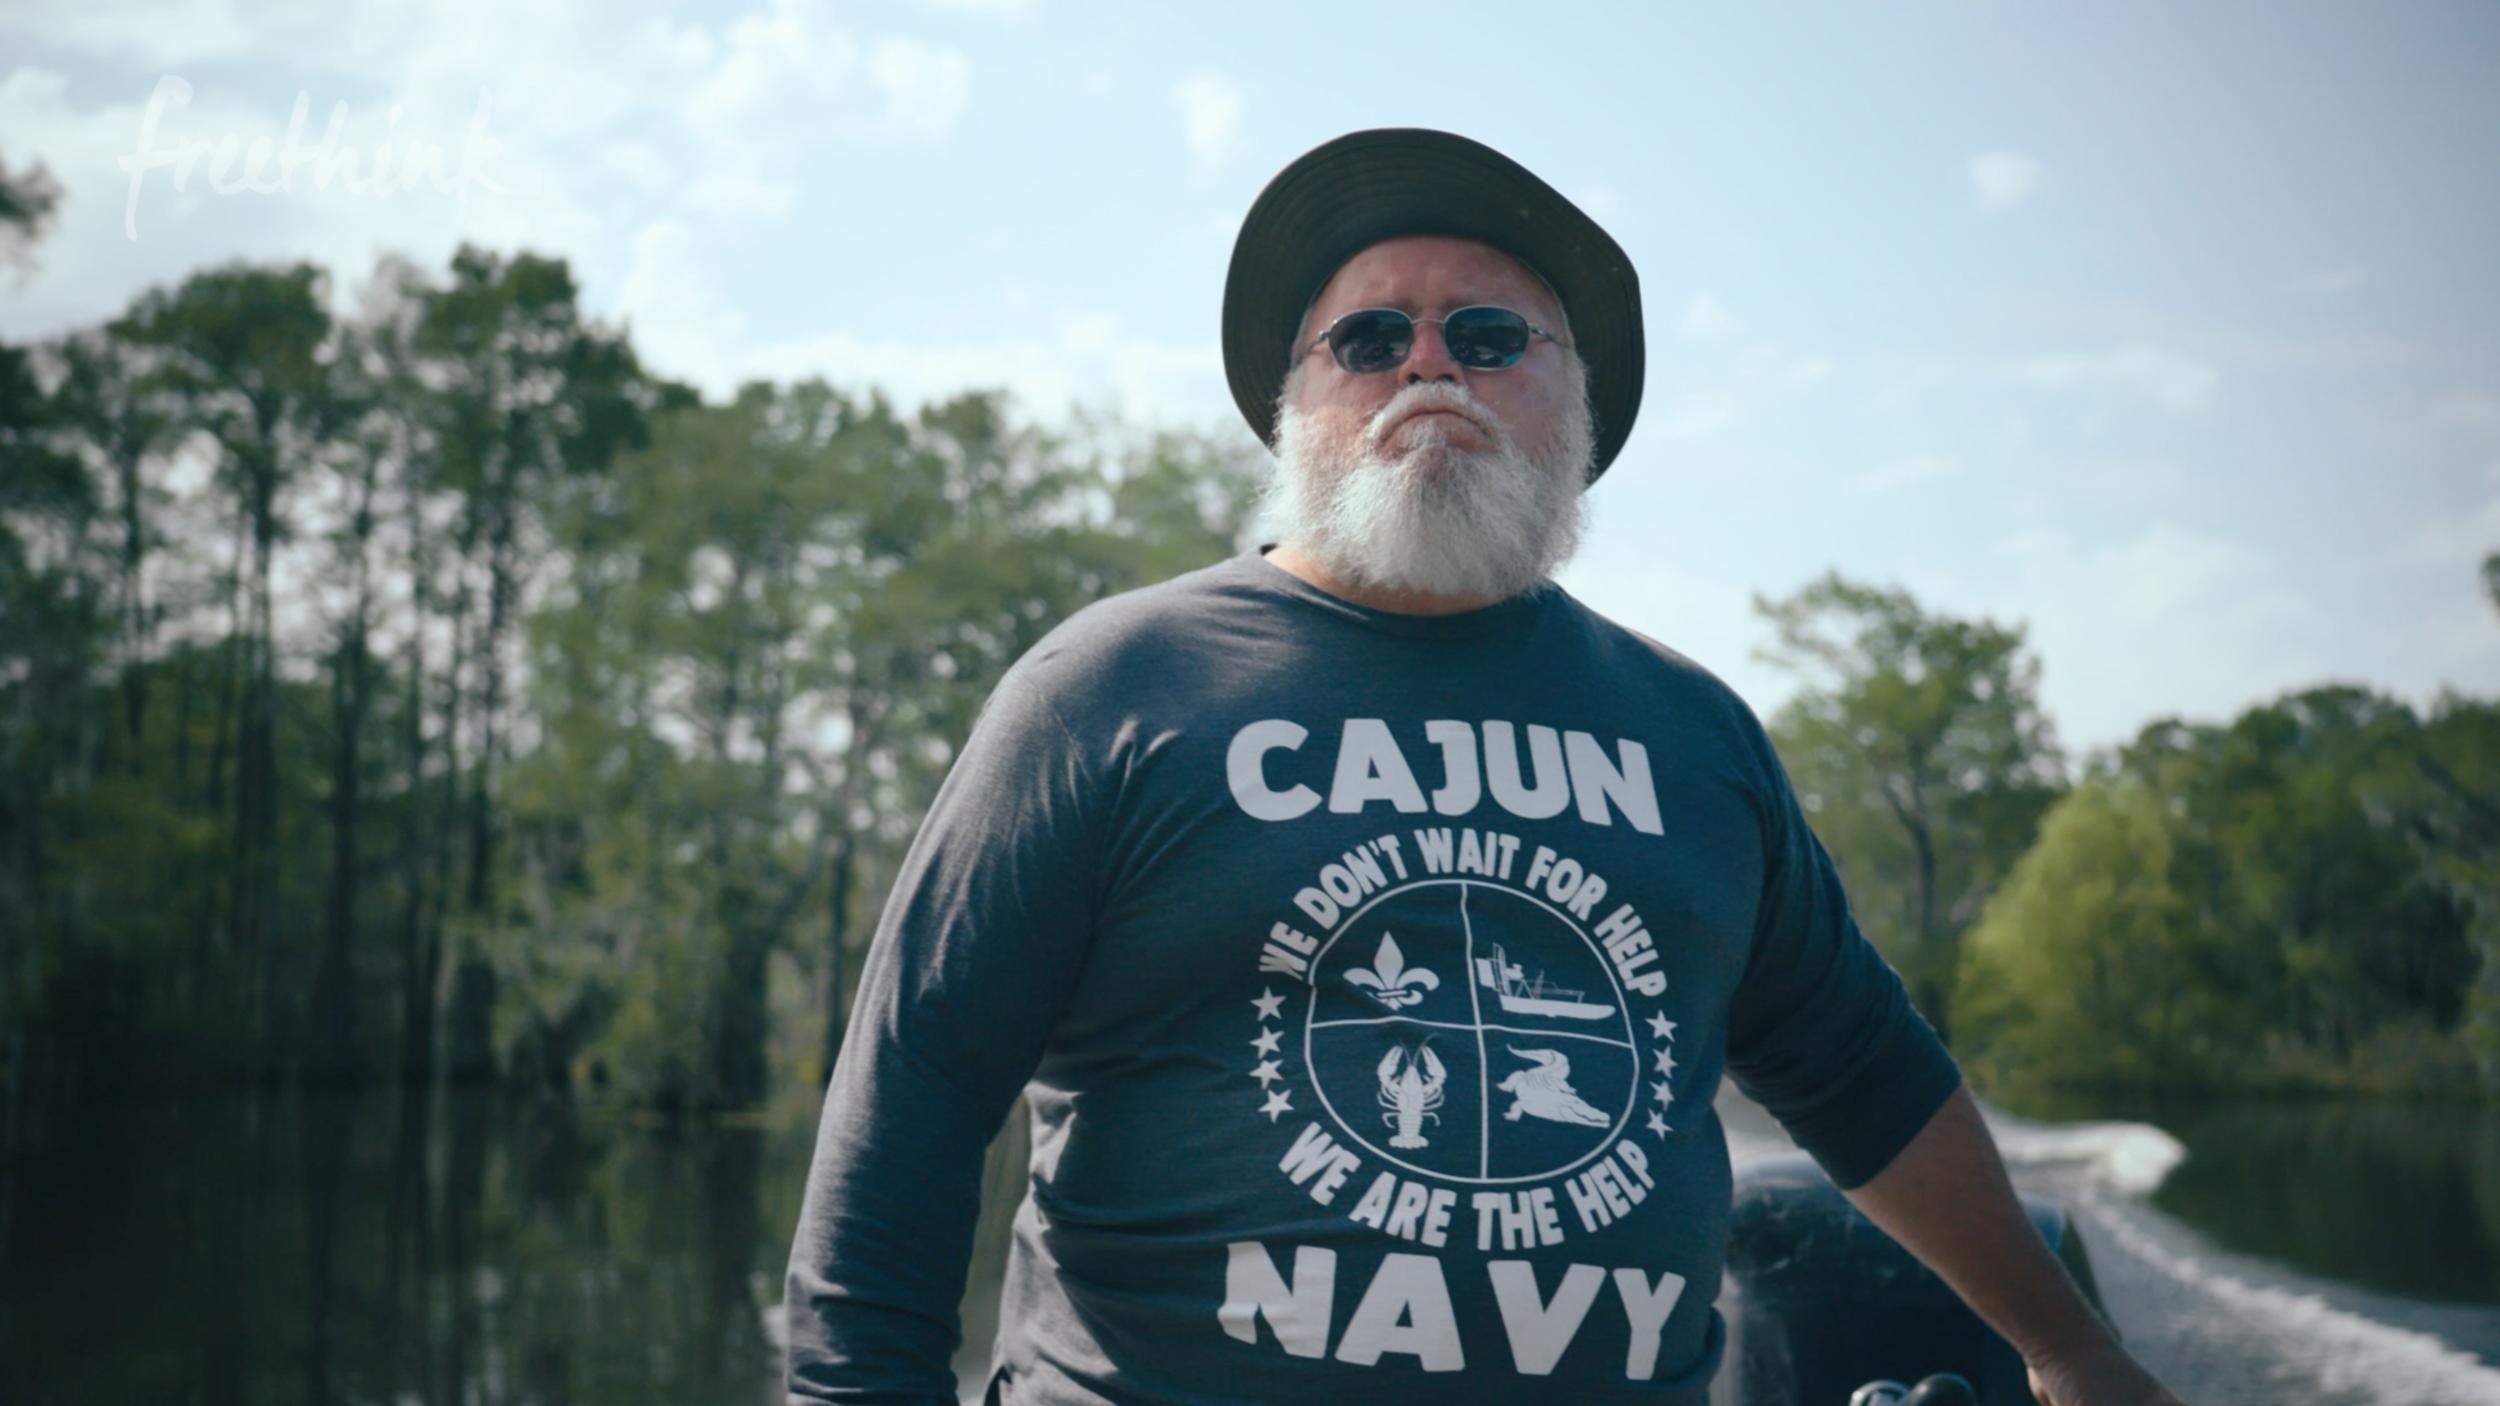 Cajun Navy - A short documentary on louisiana's cajun navy and their preparation for hurricane season.